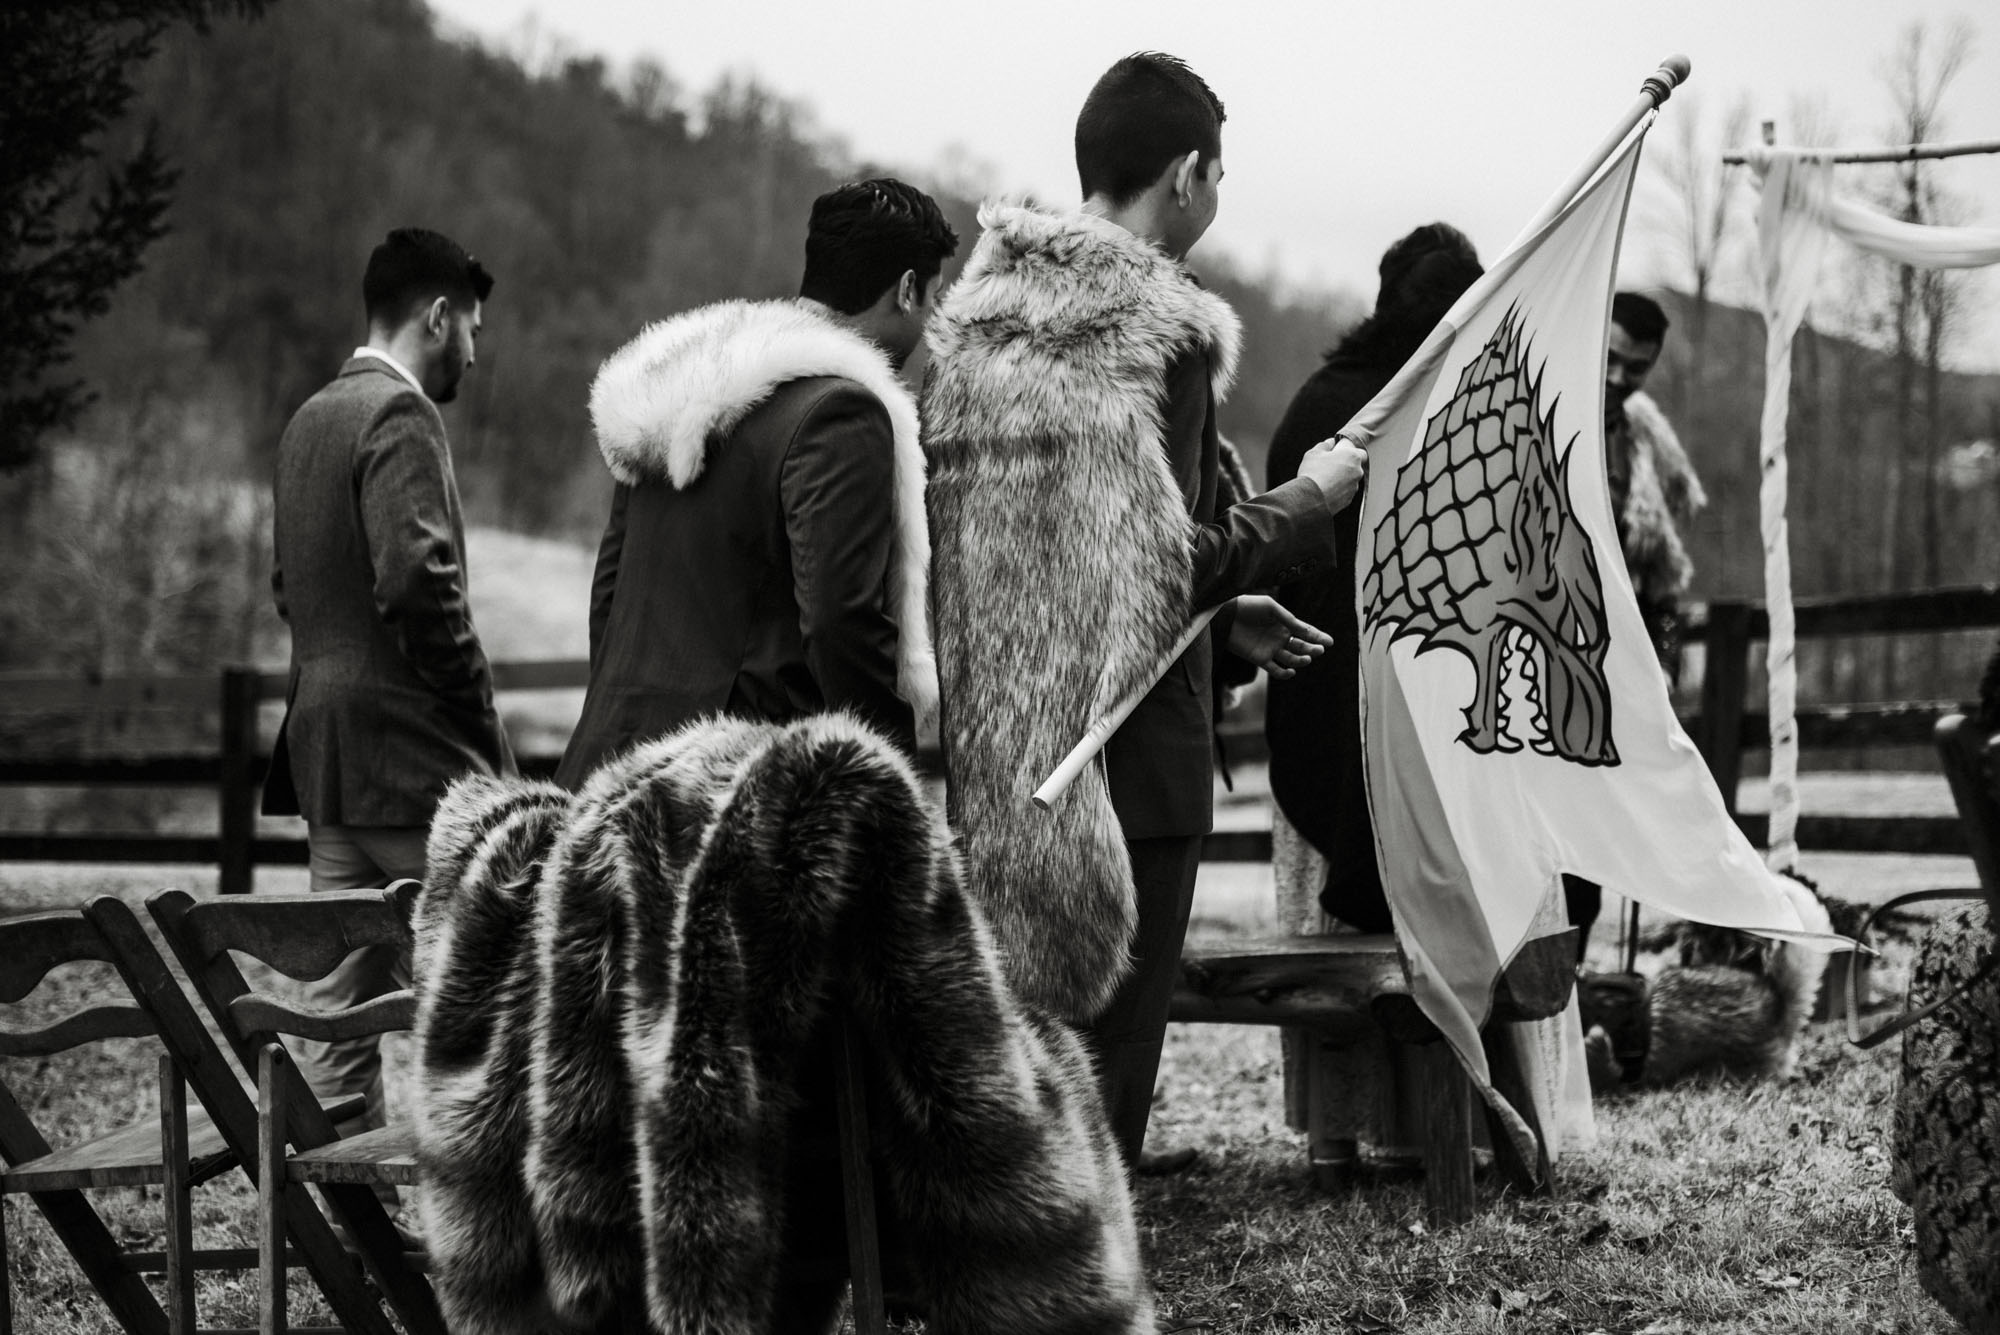 Game of Thrones Elopement - Winter Elopement - Shenandoah National Park Elopement Photographer - Virginia Adventure Photographer - Blue Ridge Parkway Elopement Photographer_32.jpg